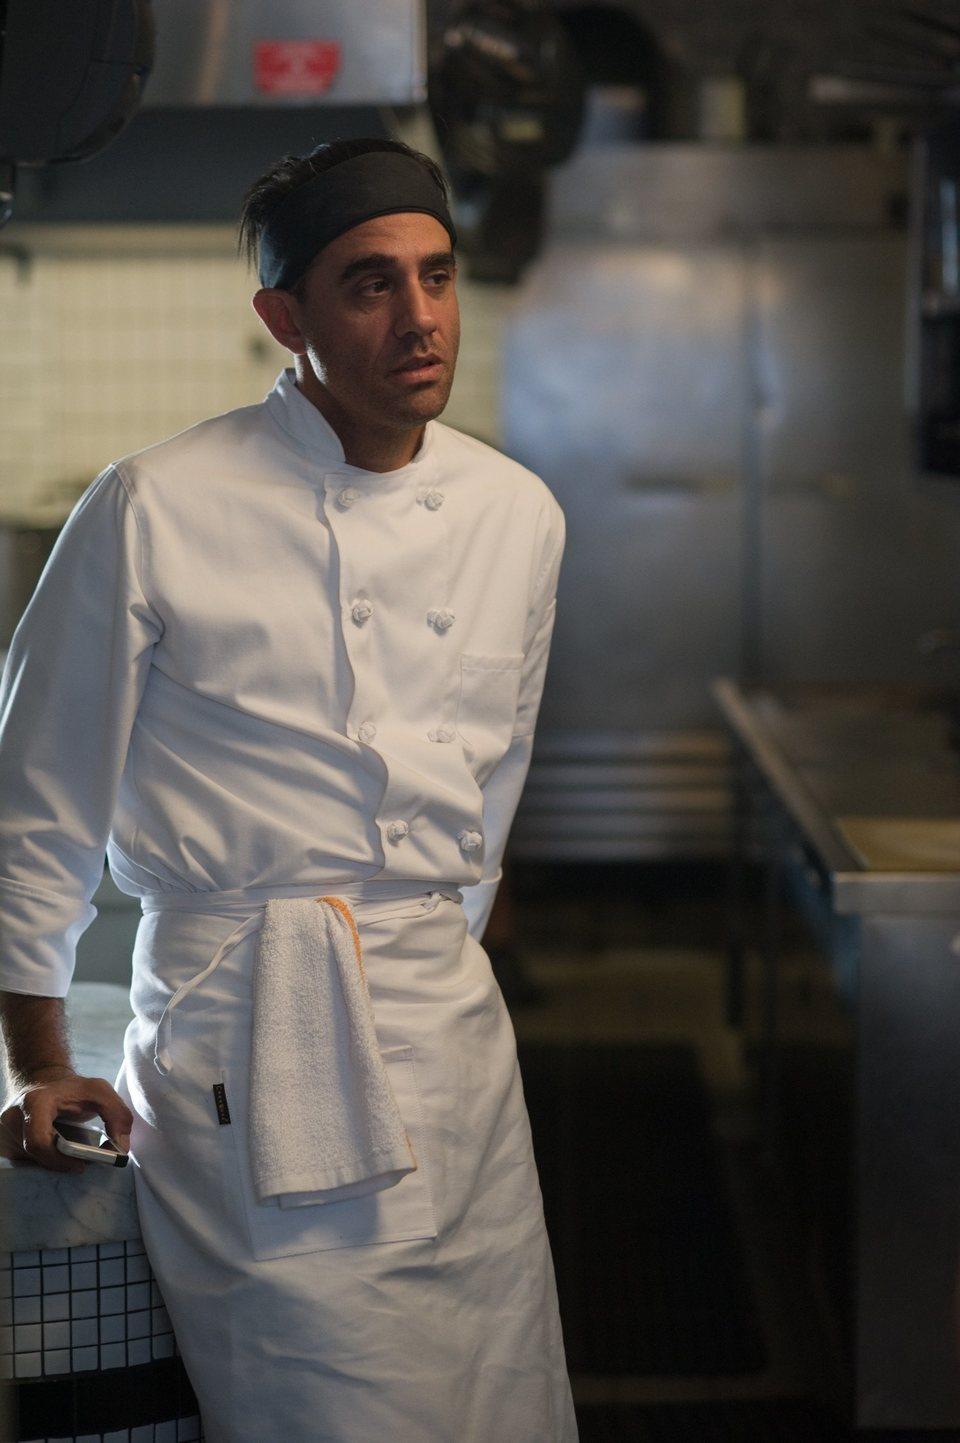 #Chef, fotograma 4 de 18